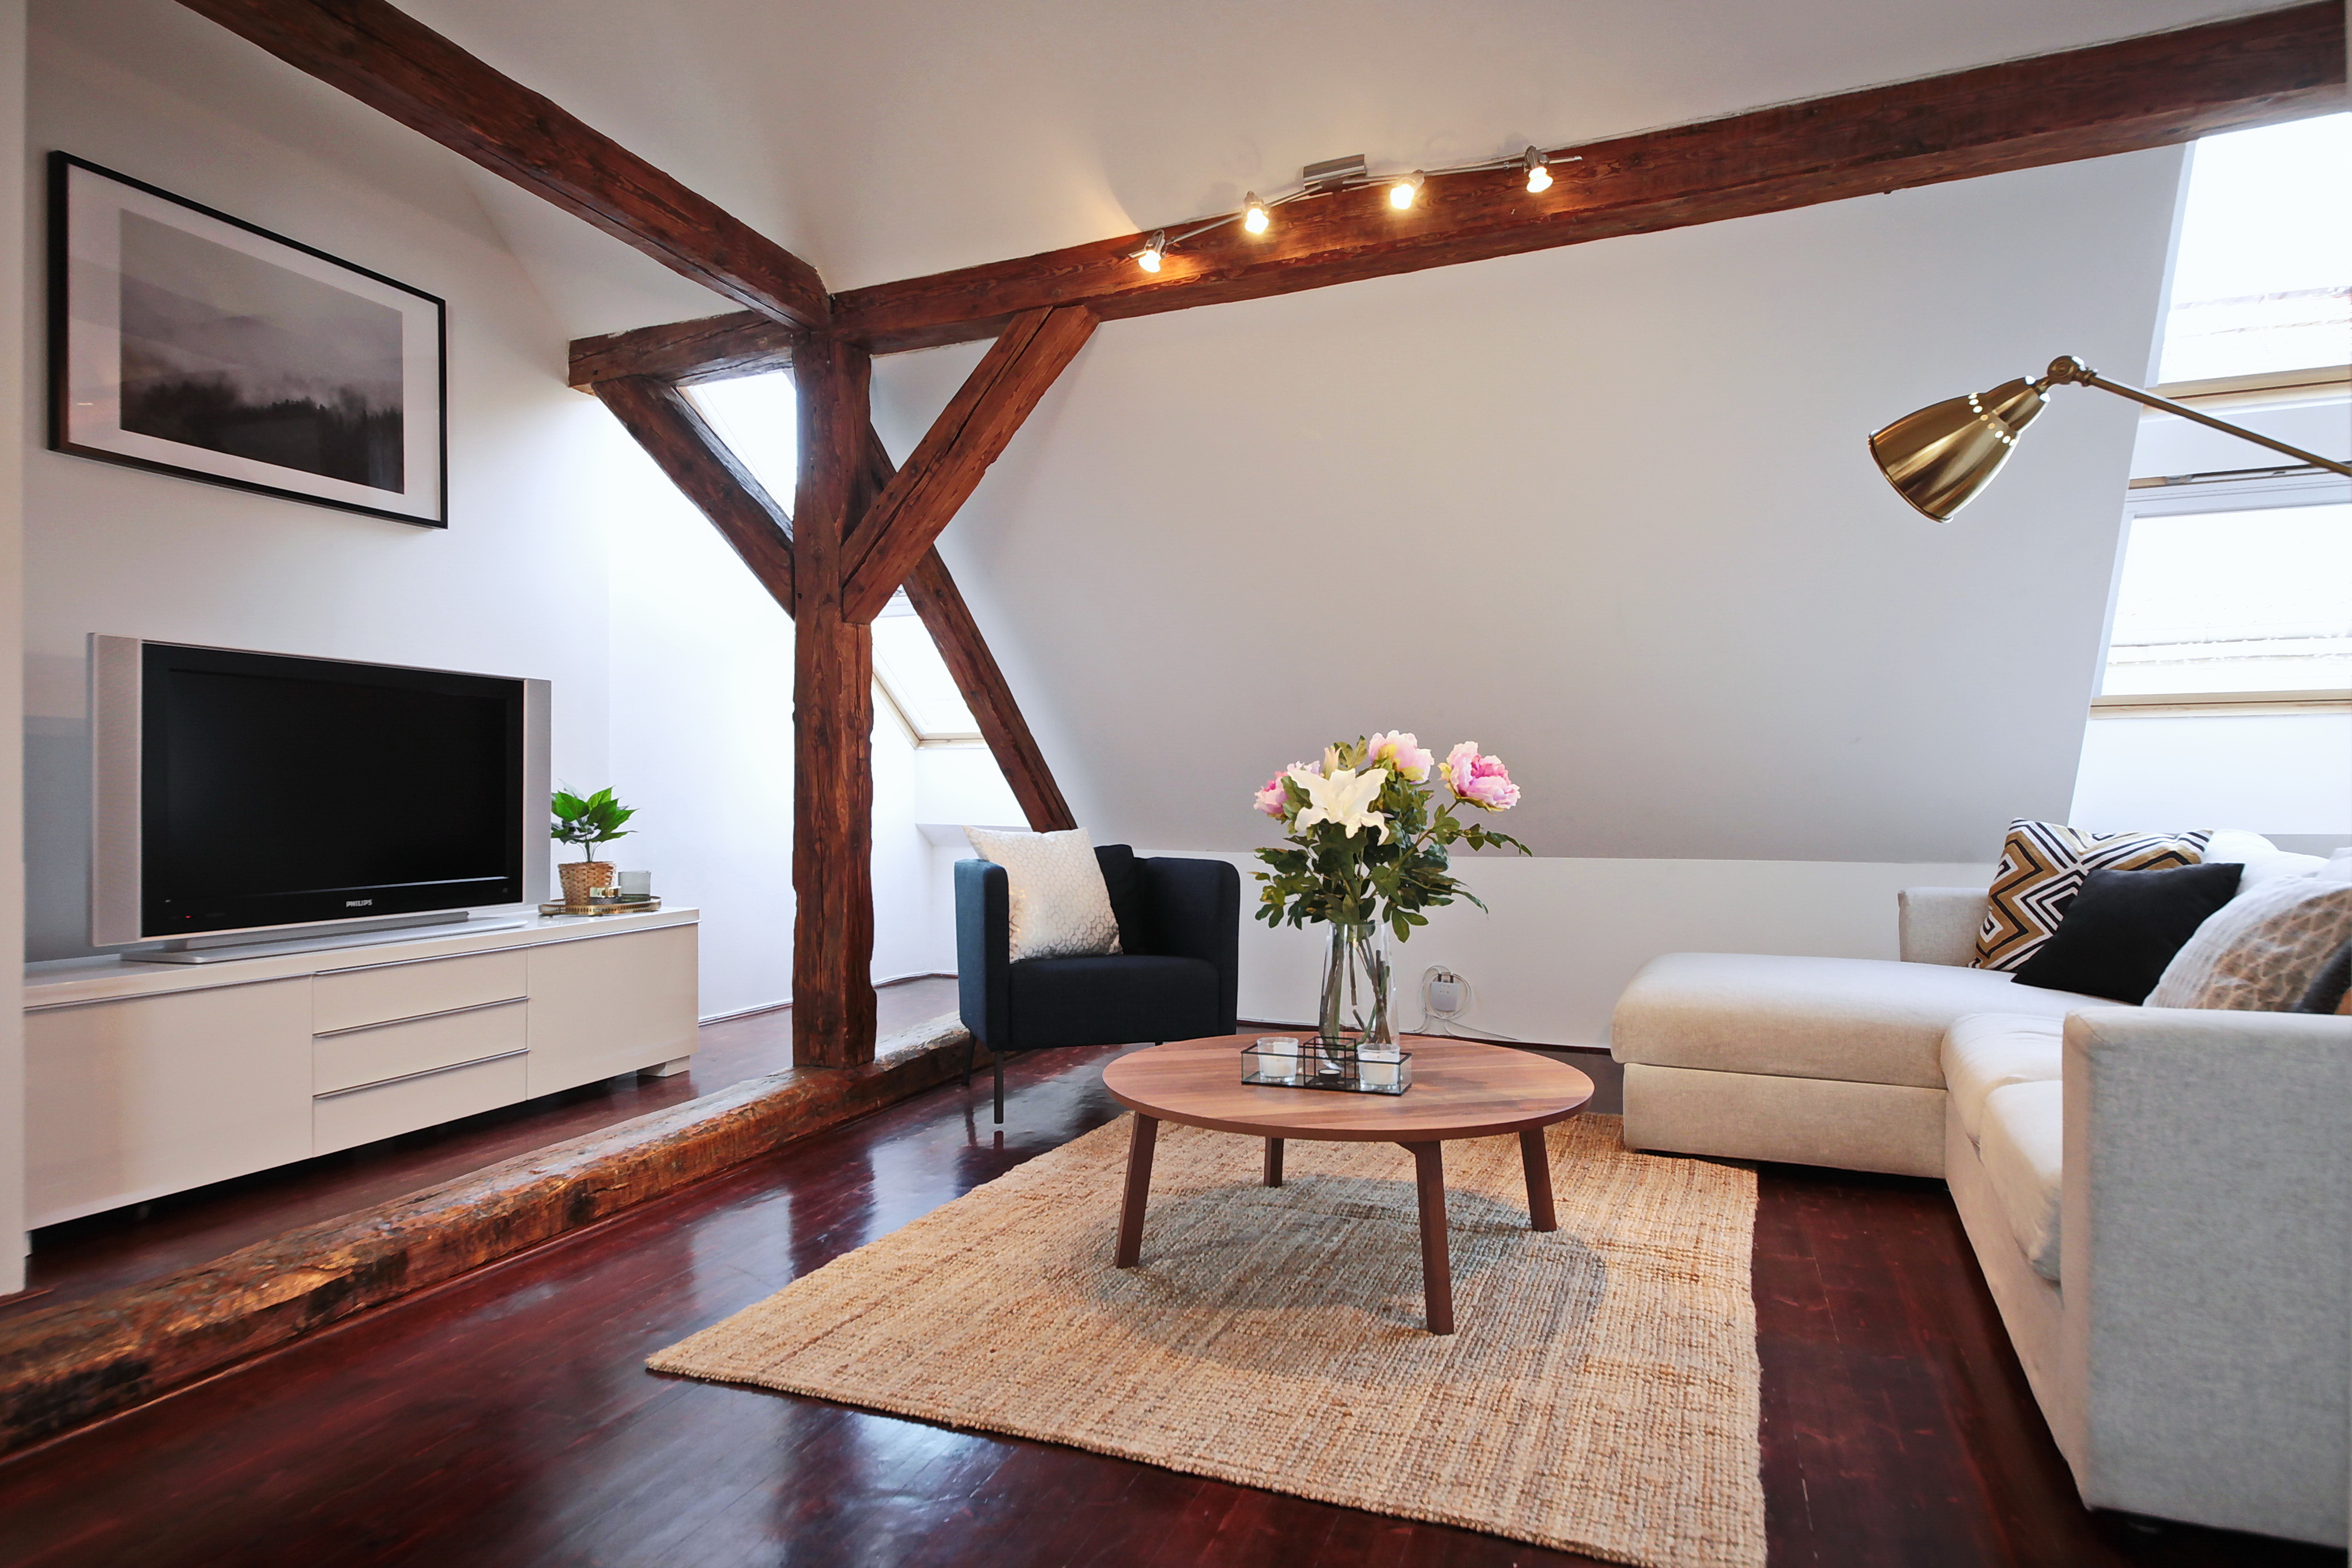 Wenceslas Sq Dream Apartment Apartments For Rent In Praha 1 Hlavni Mesto Praha Czechia